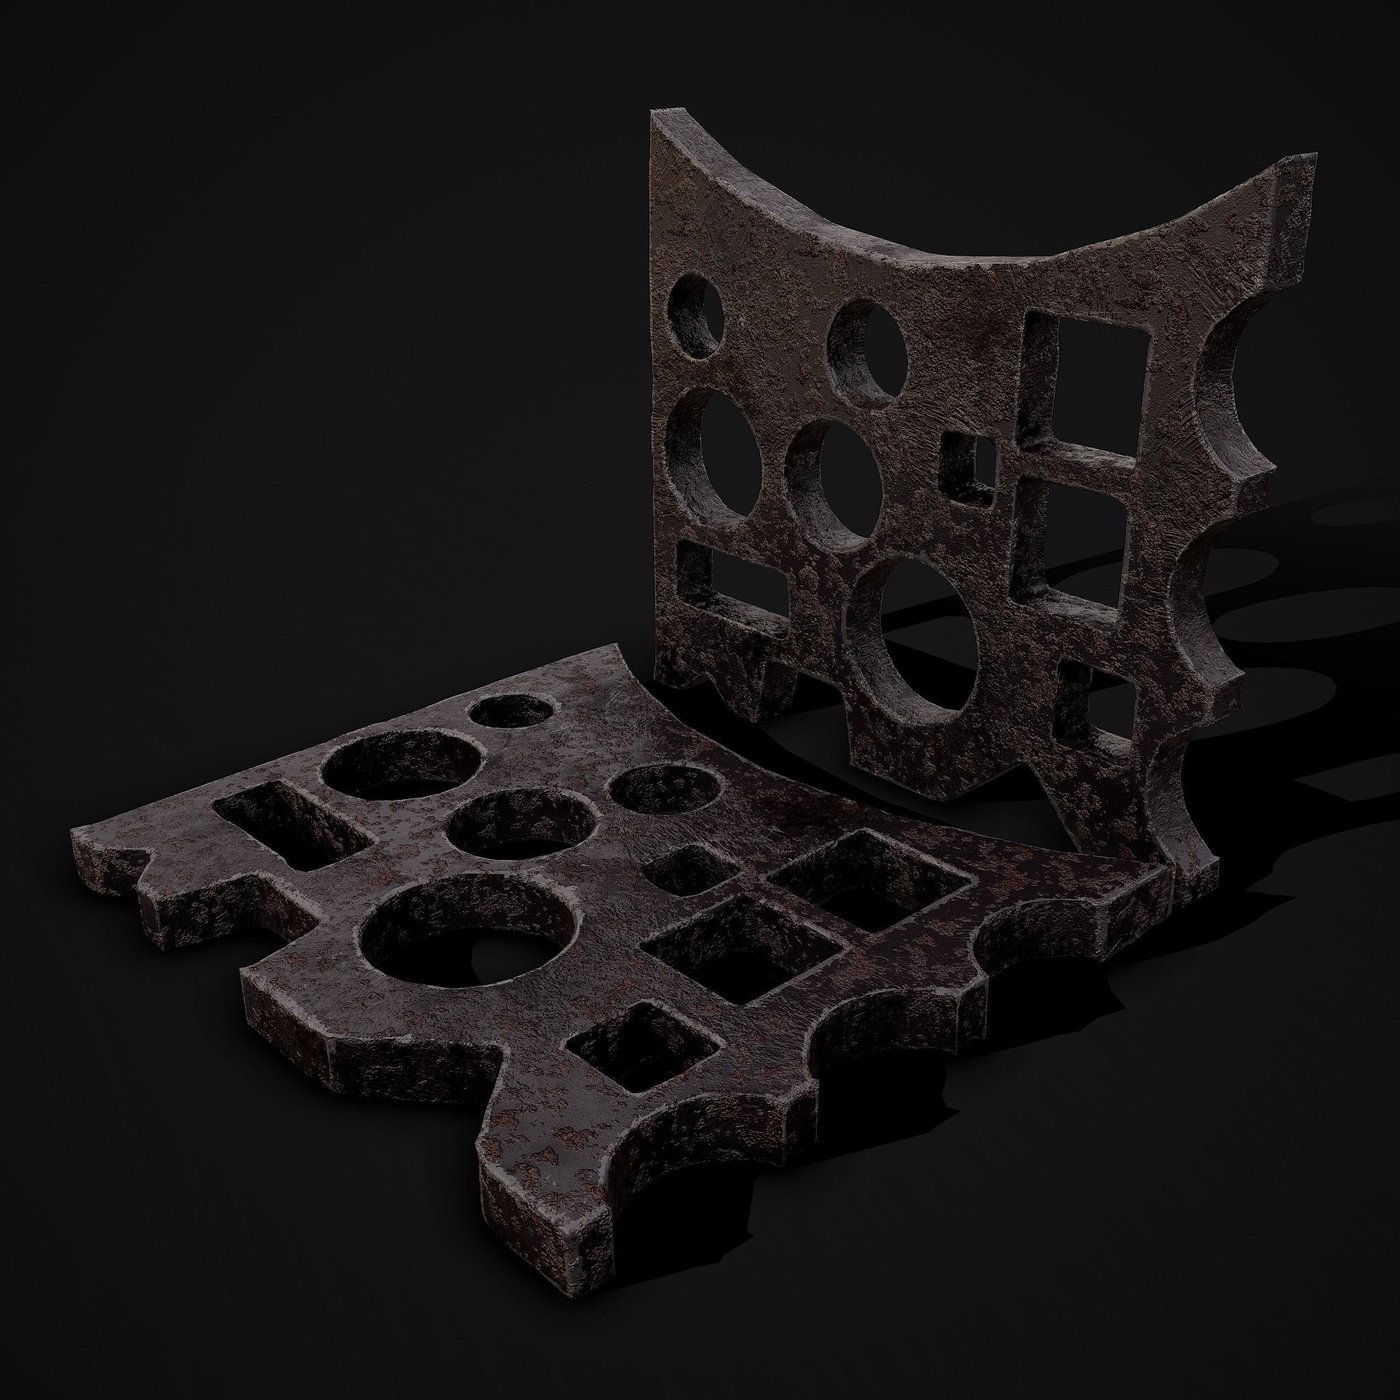 Swage Block blacksmith prop